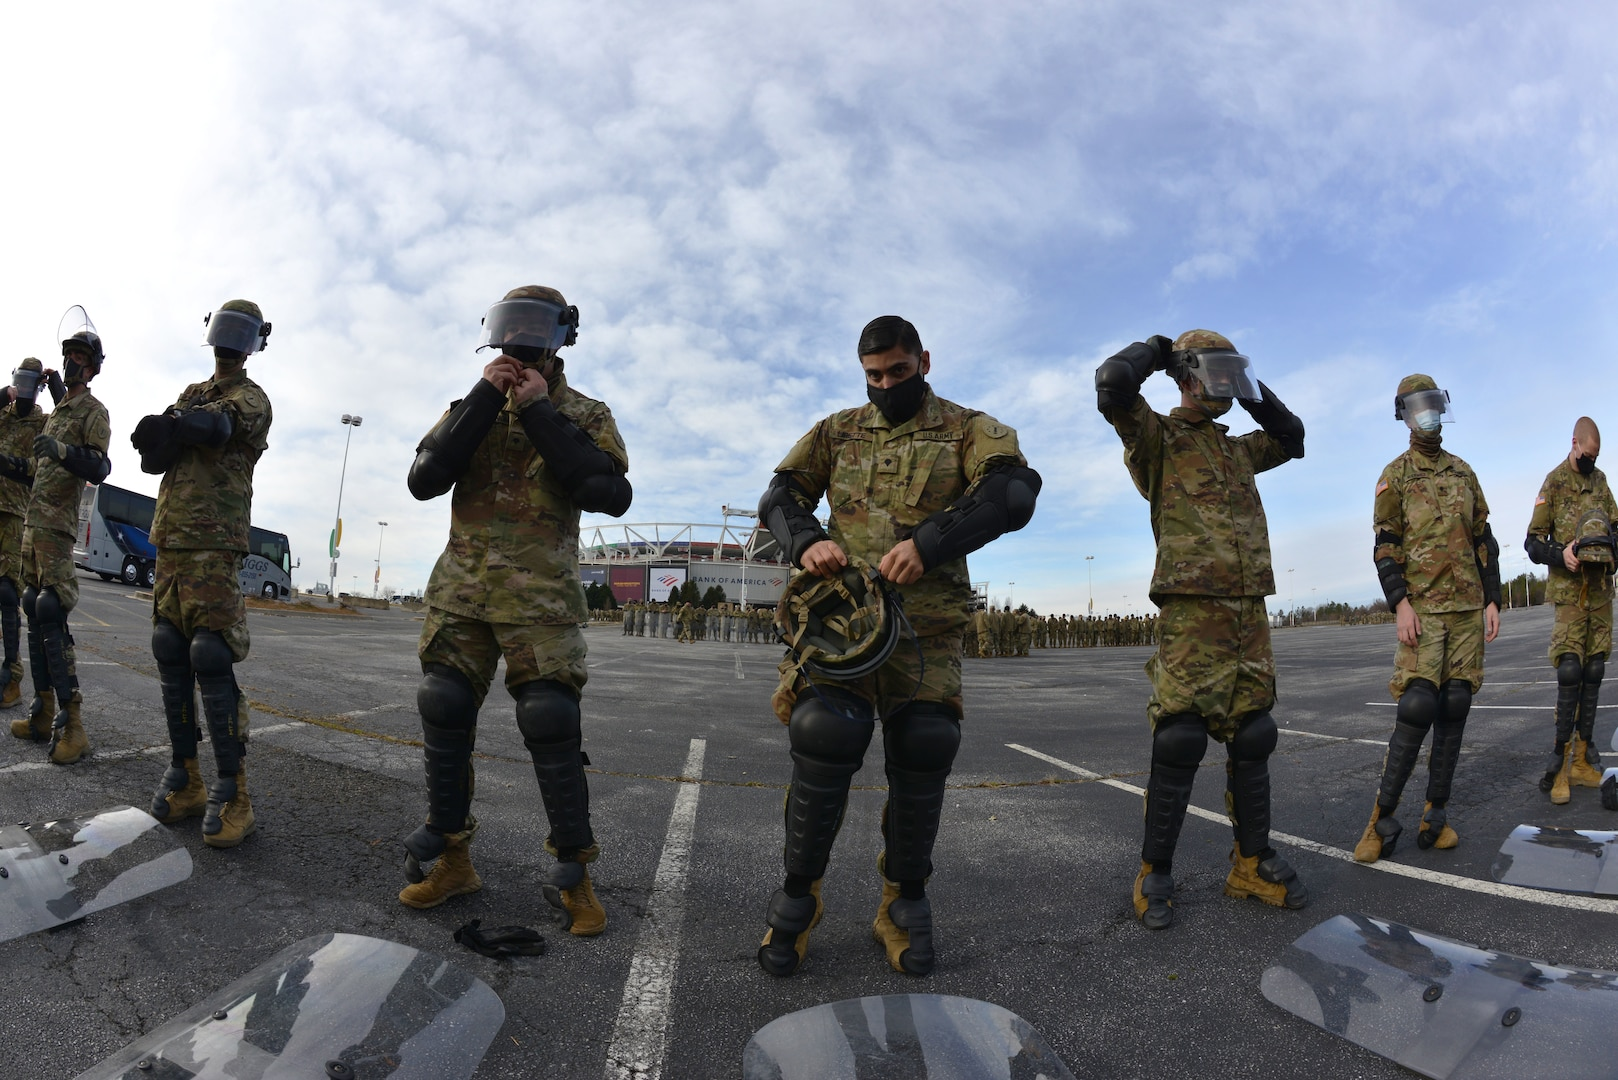 New Hampshire guardsmen conduct civil disturbance training in the FedExField parking lot Jan. 18, 2021, in Landover, Md.